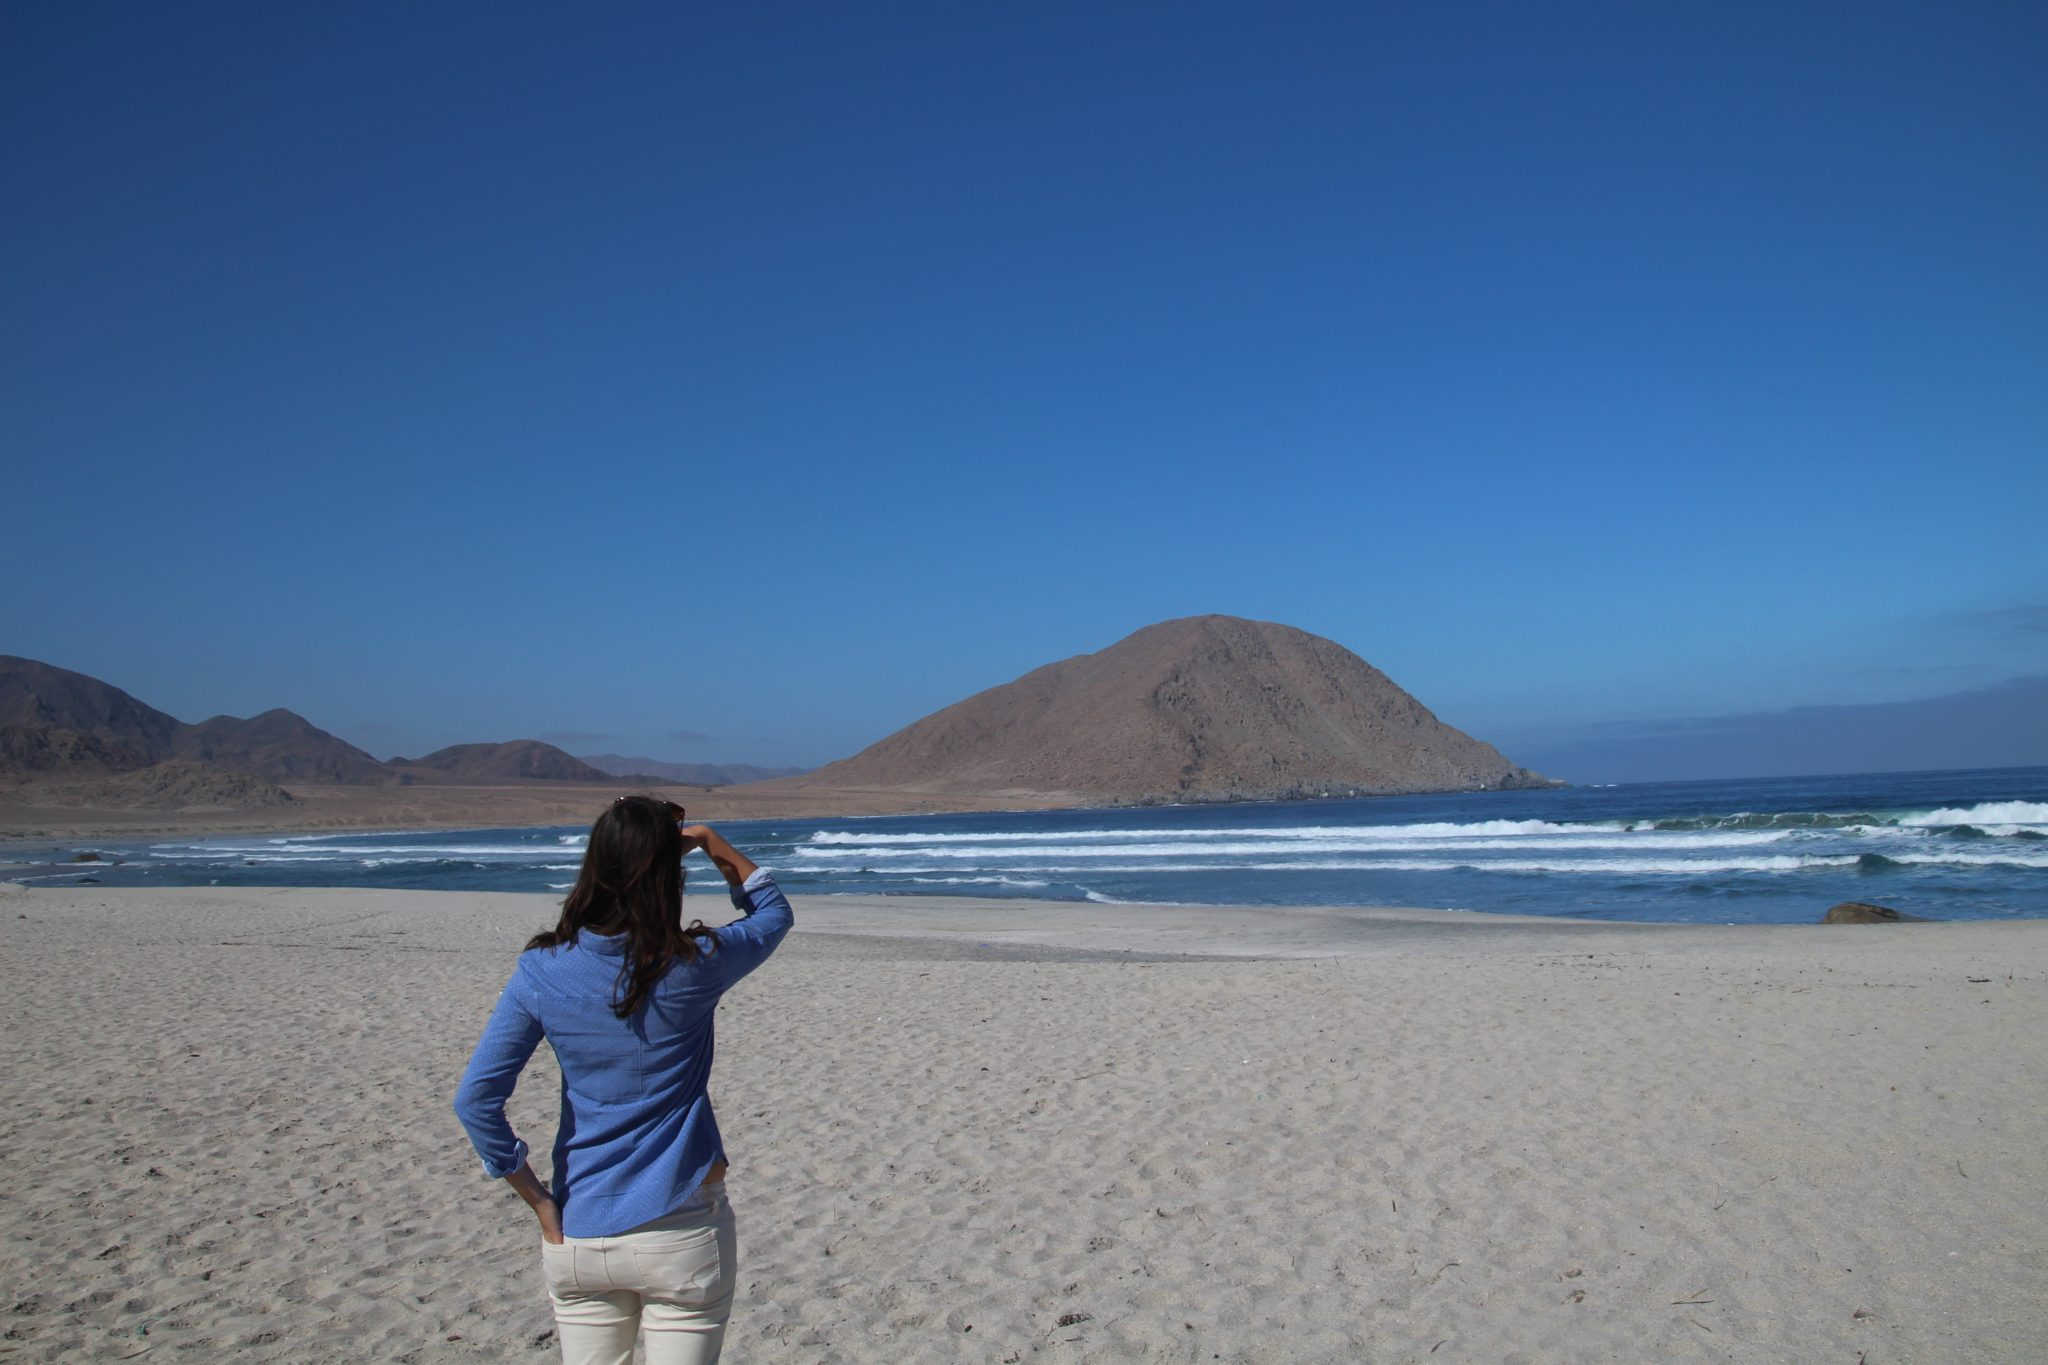 playa blanca atacama chili pan de azucar